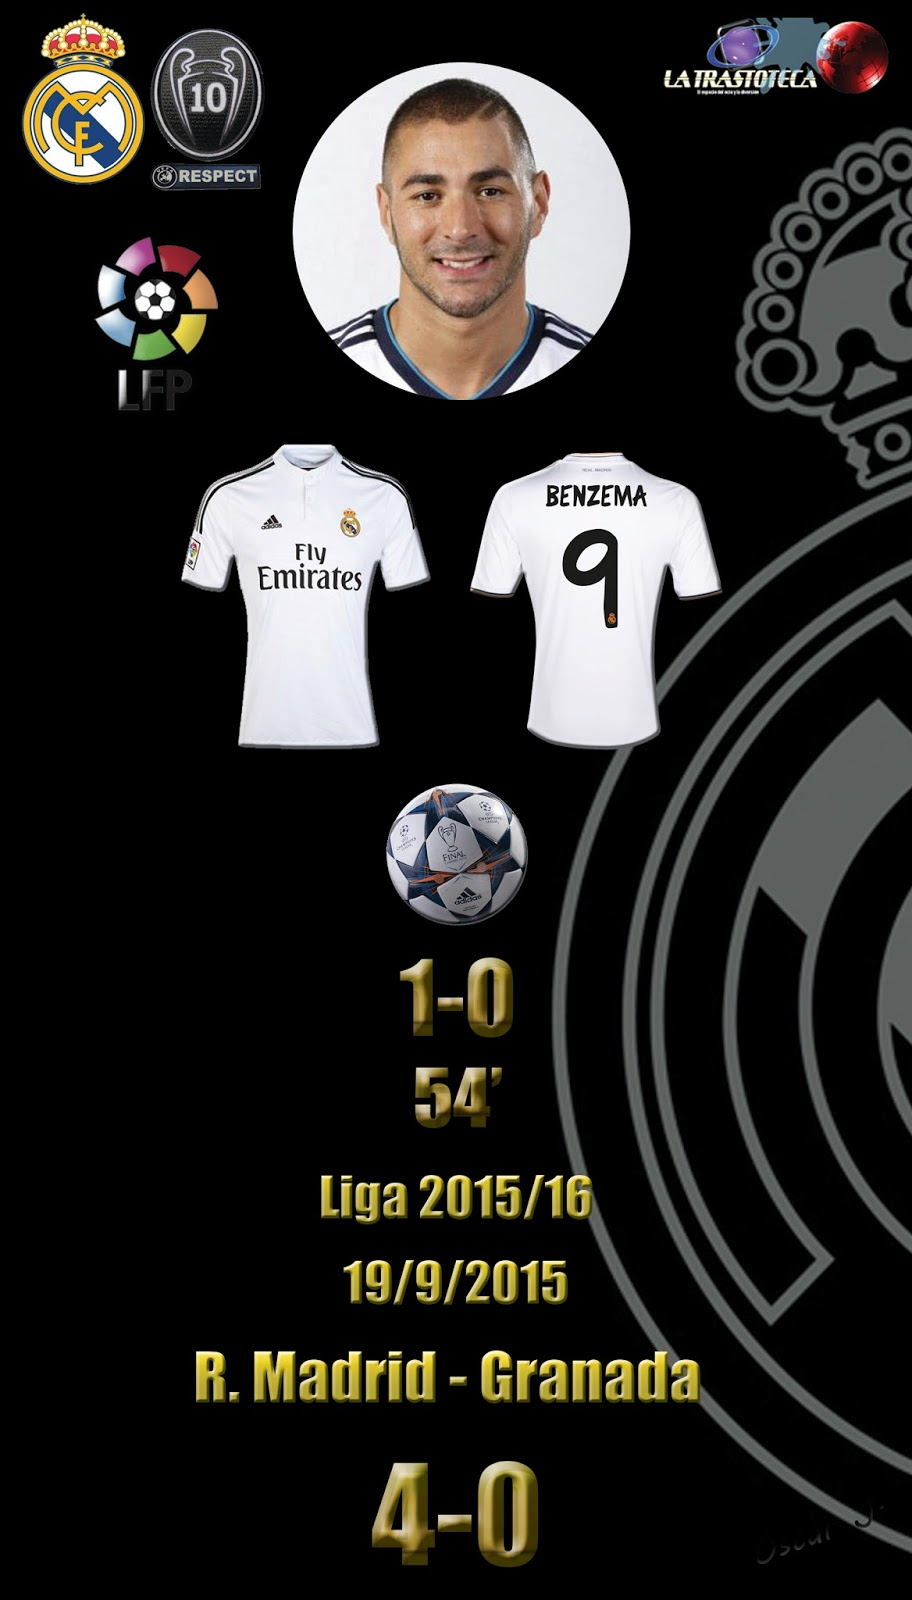 Real madrid 1 0 granada liga 2015 16 jornada 4 19 for Correo real madrid